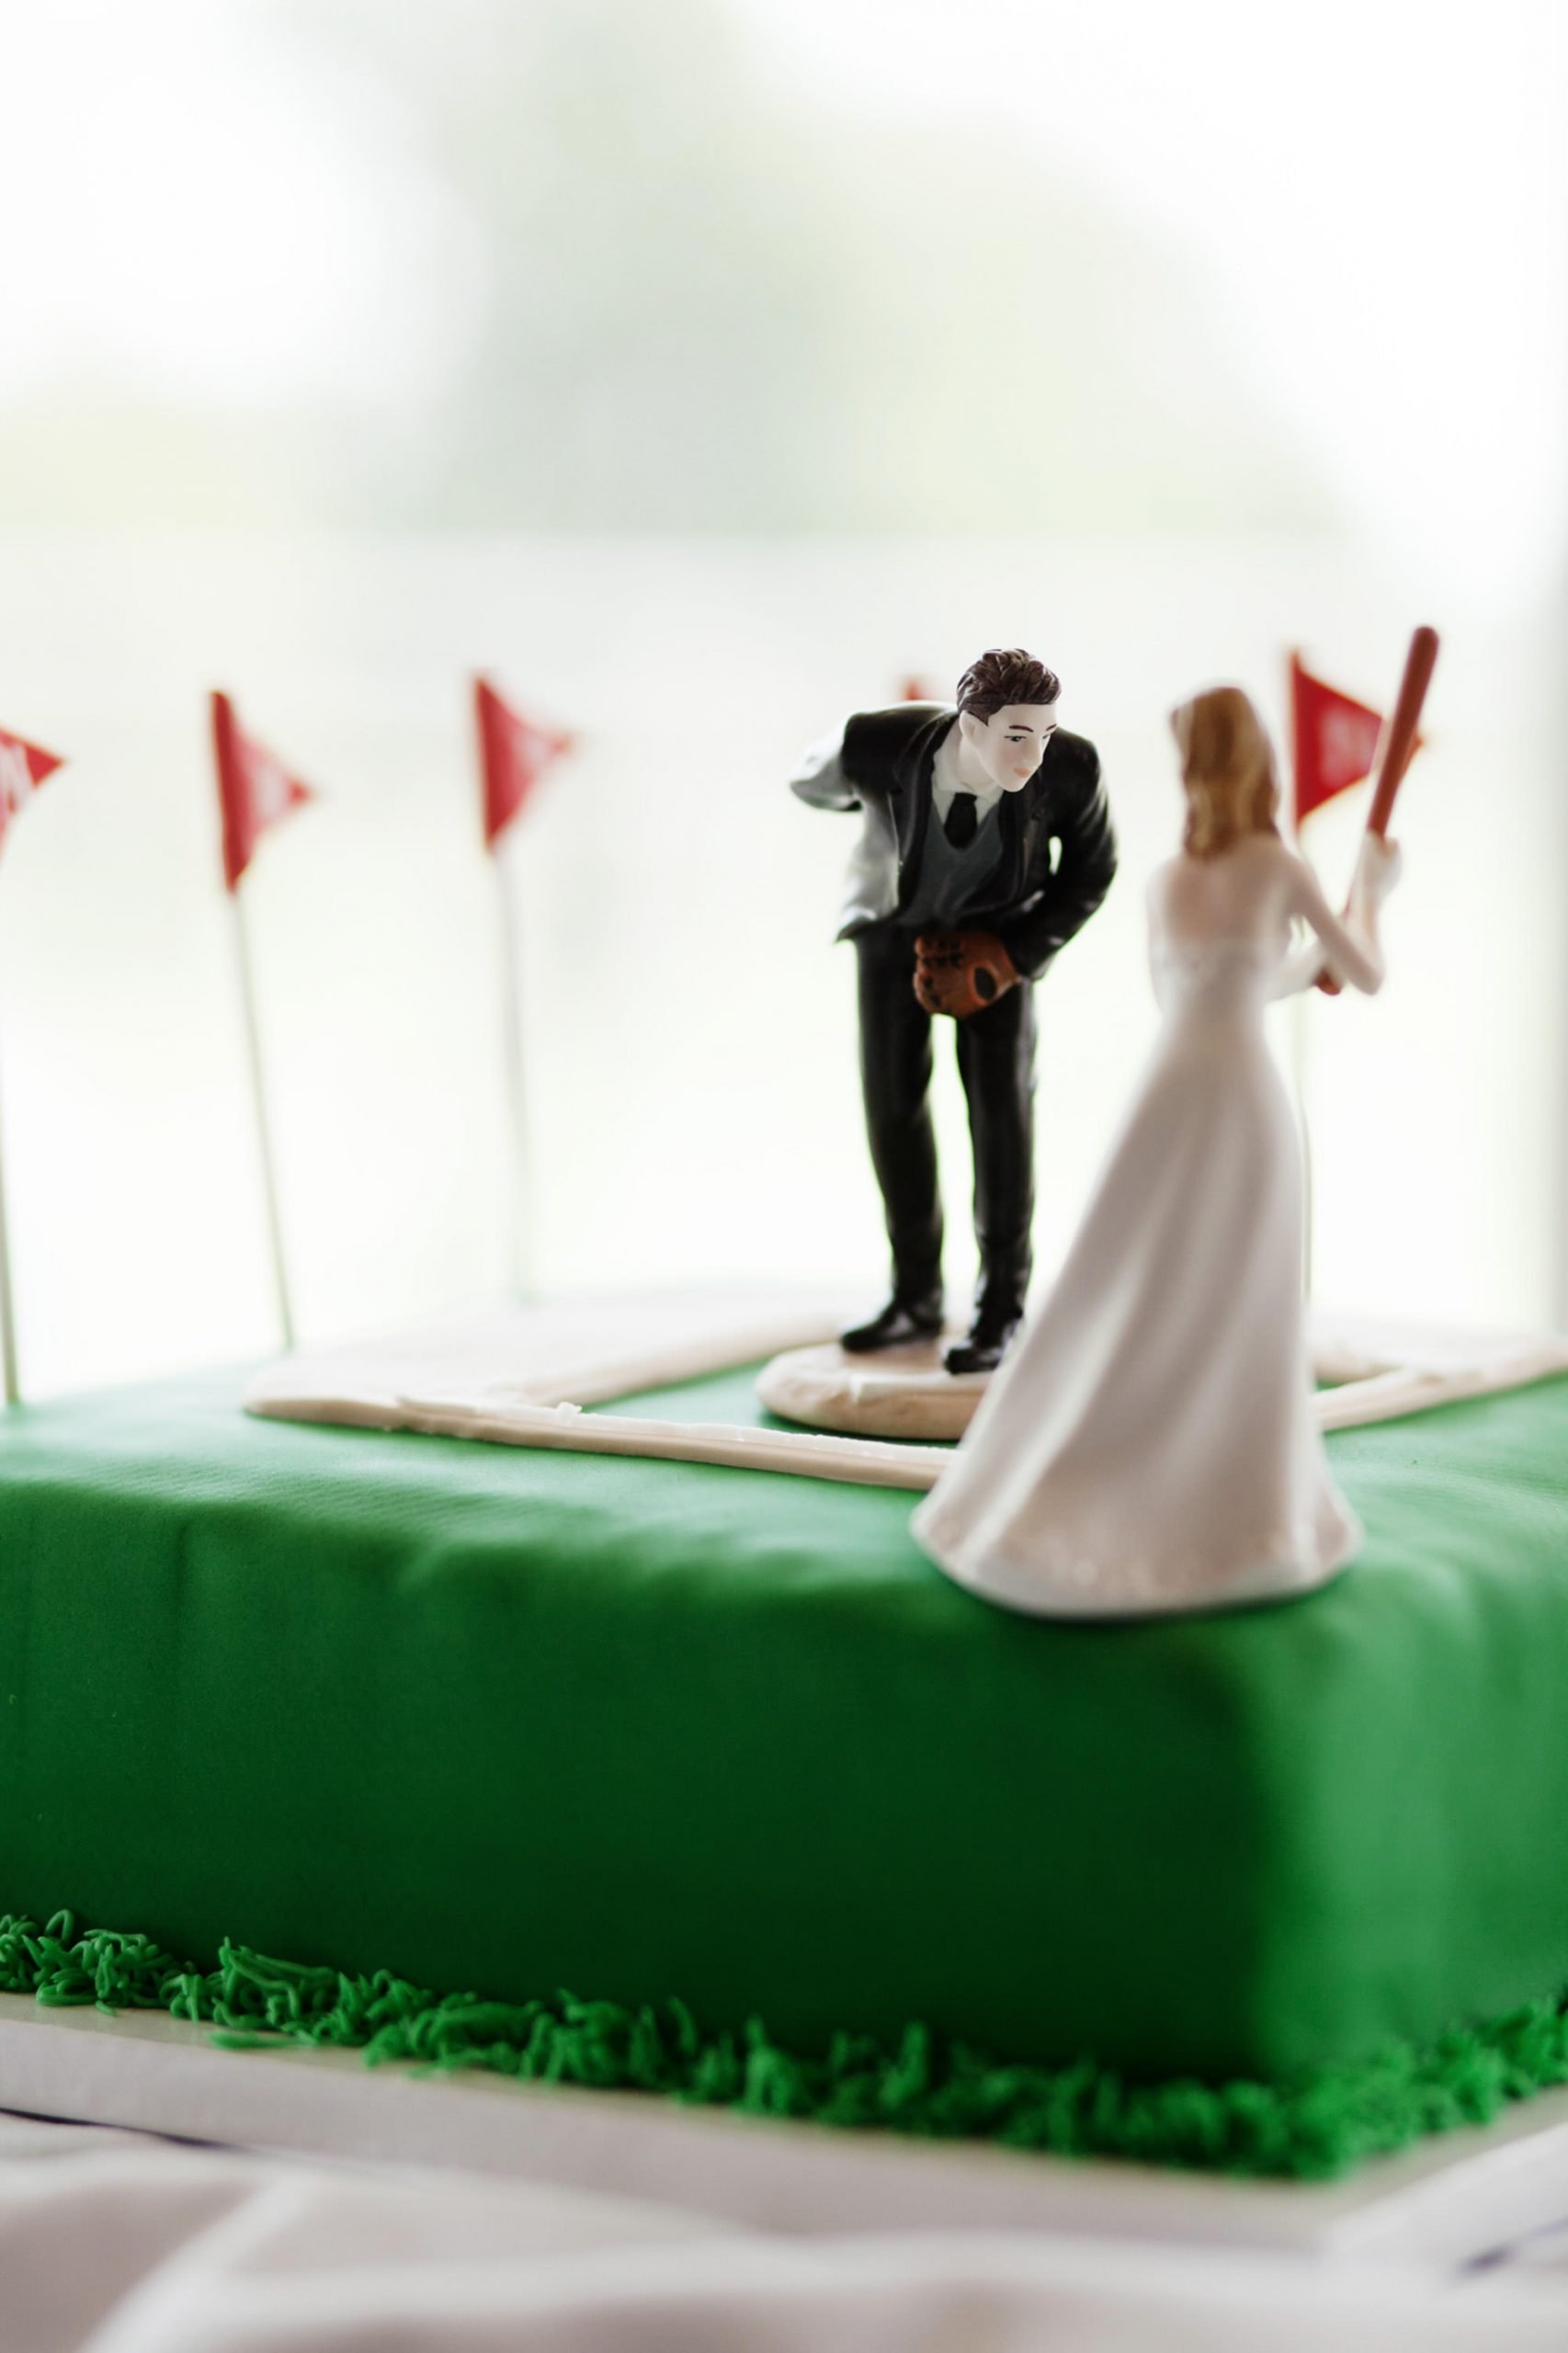 Springfield Golf and Country Club Wedding  I  The groom's cake has a baseball theme.